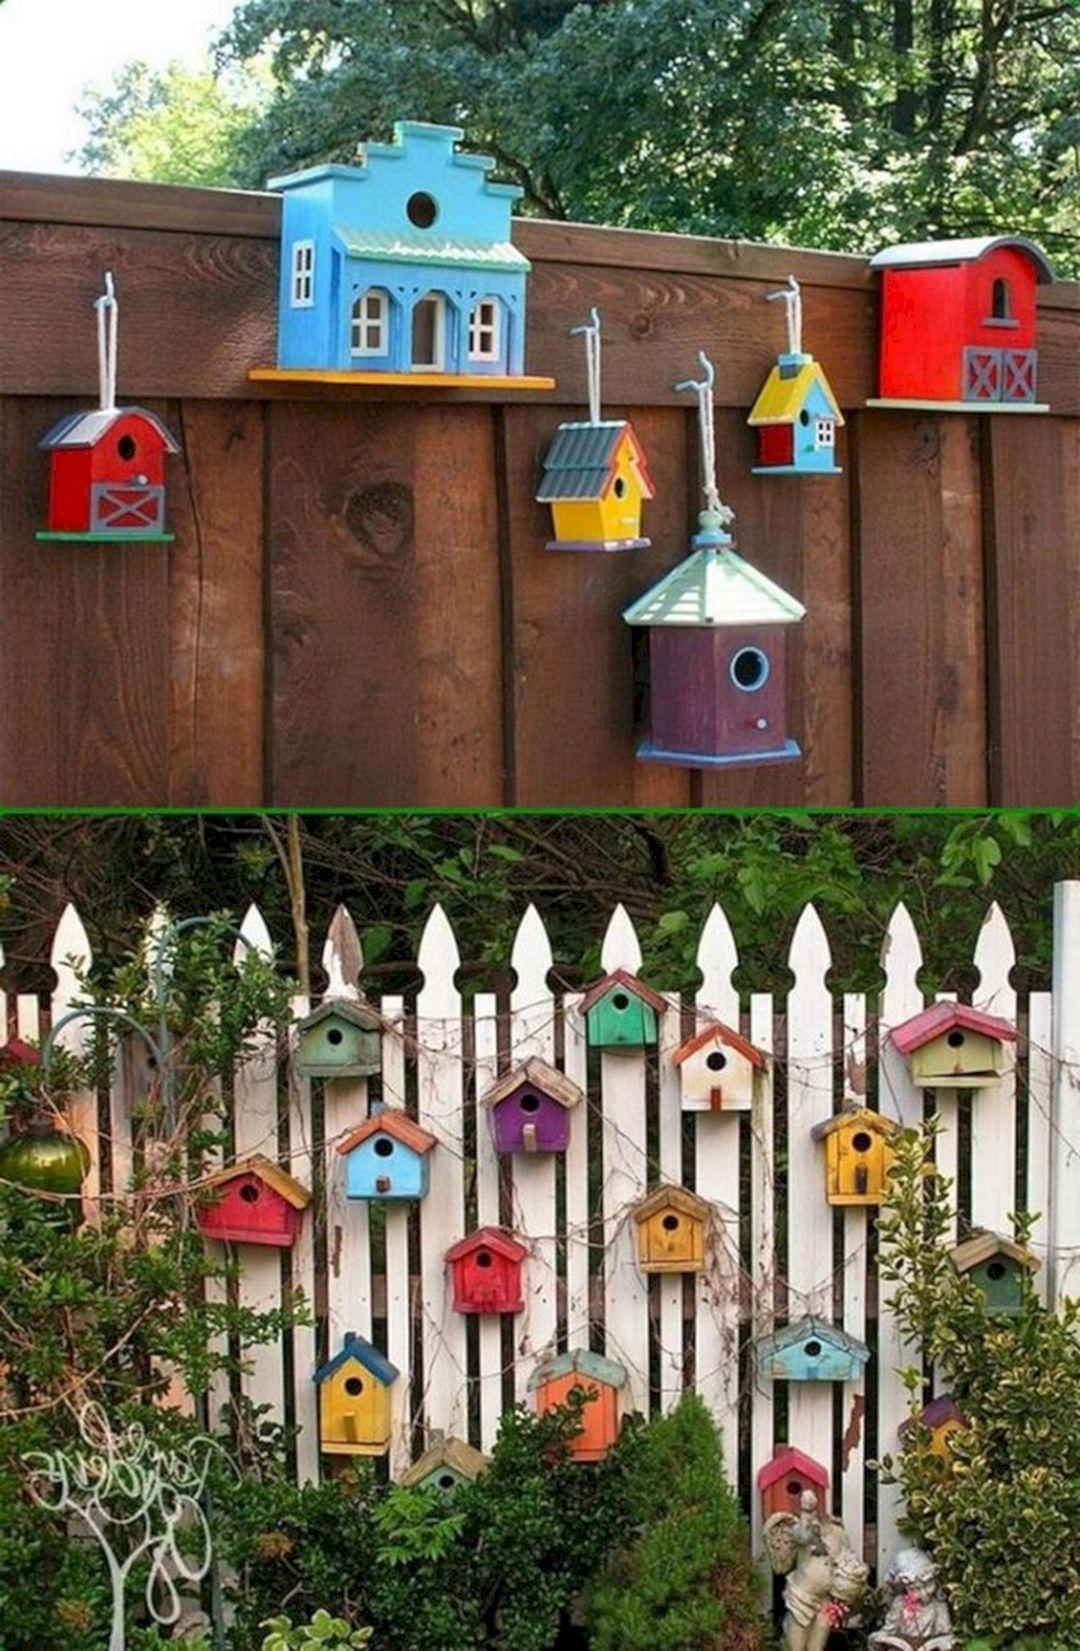 15 awesome birdhouse ideas to make your beautiful garden on backyard garden fence decor ideas id=59619